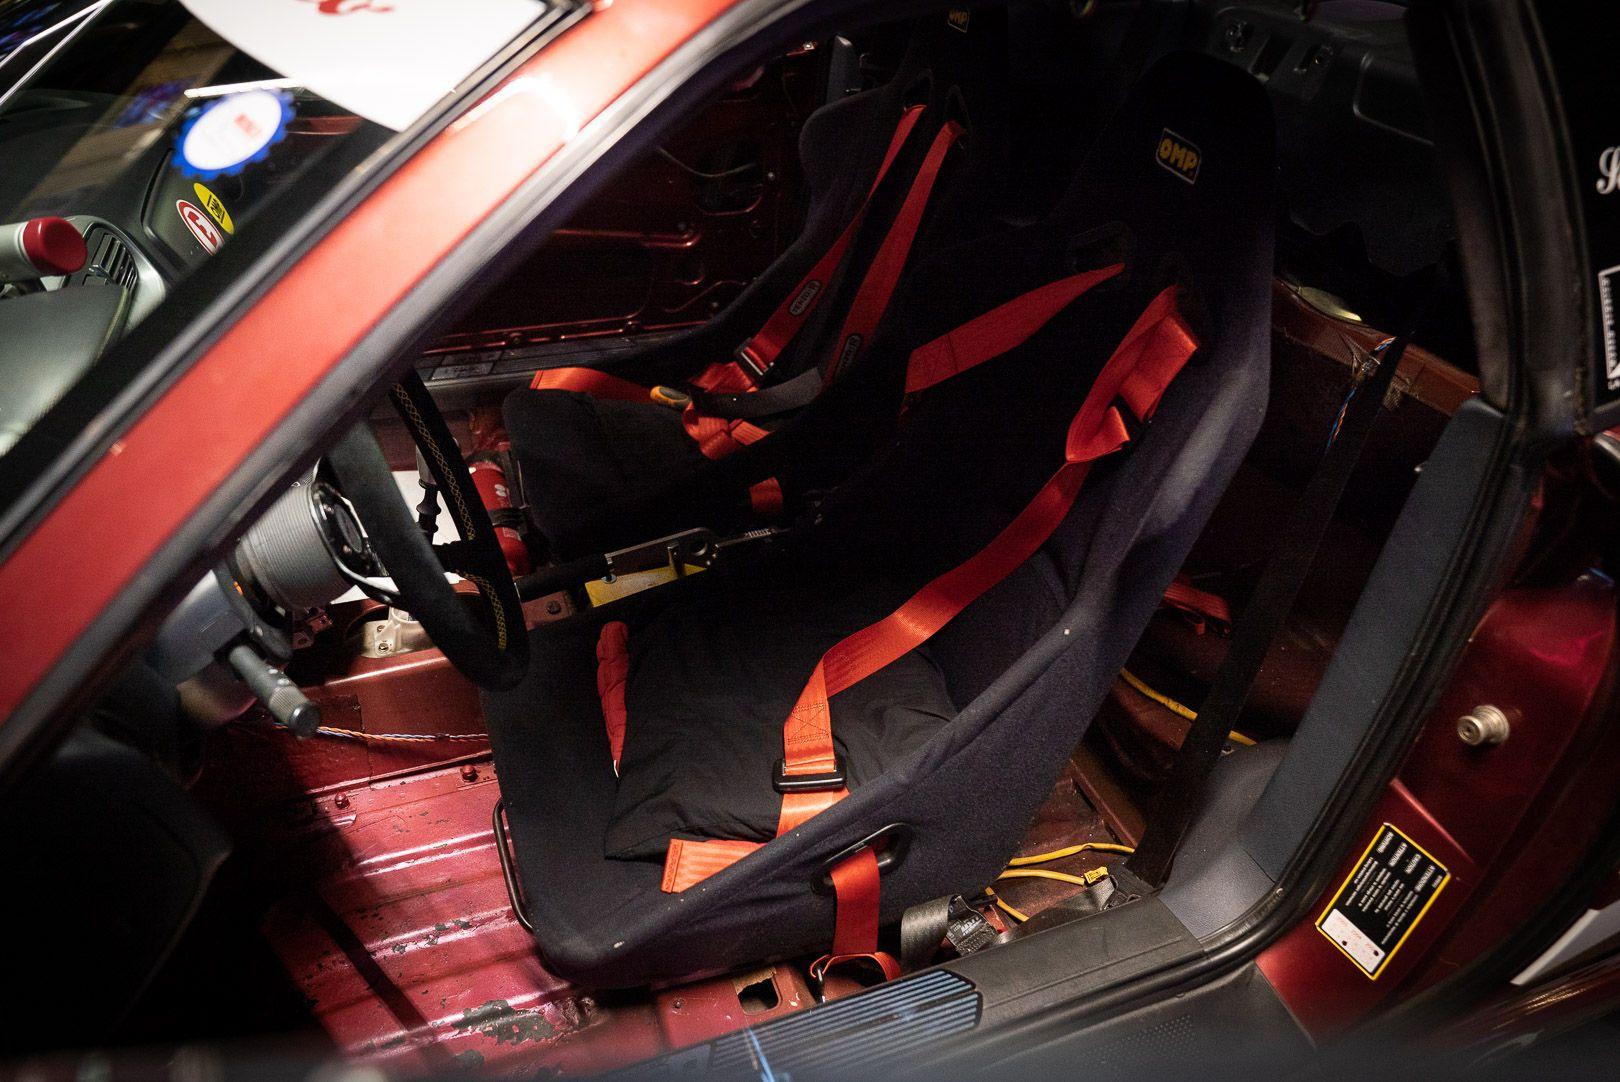 1995 Alfa Romeo GTV 2.0 V6 Turbo Cup Replica 59930